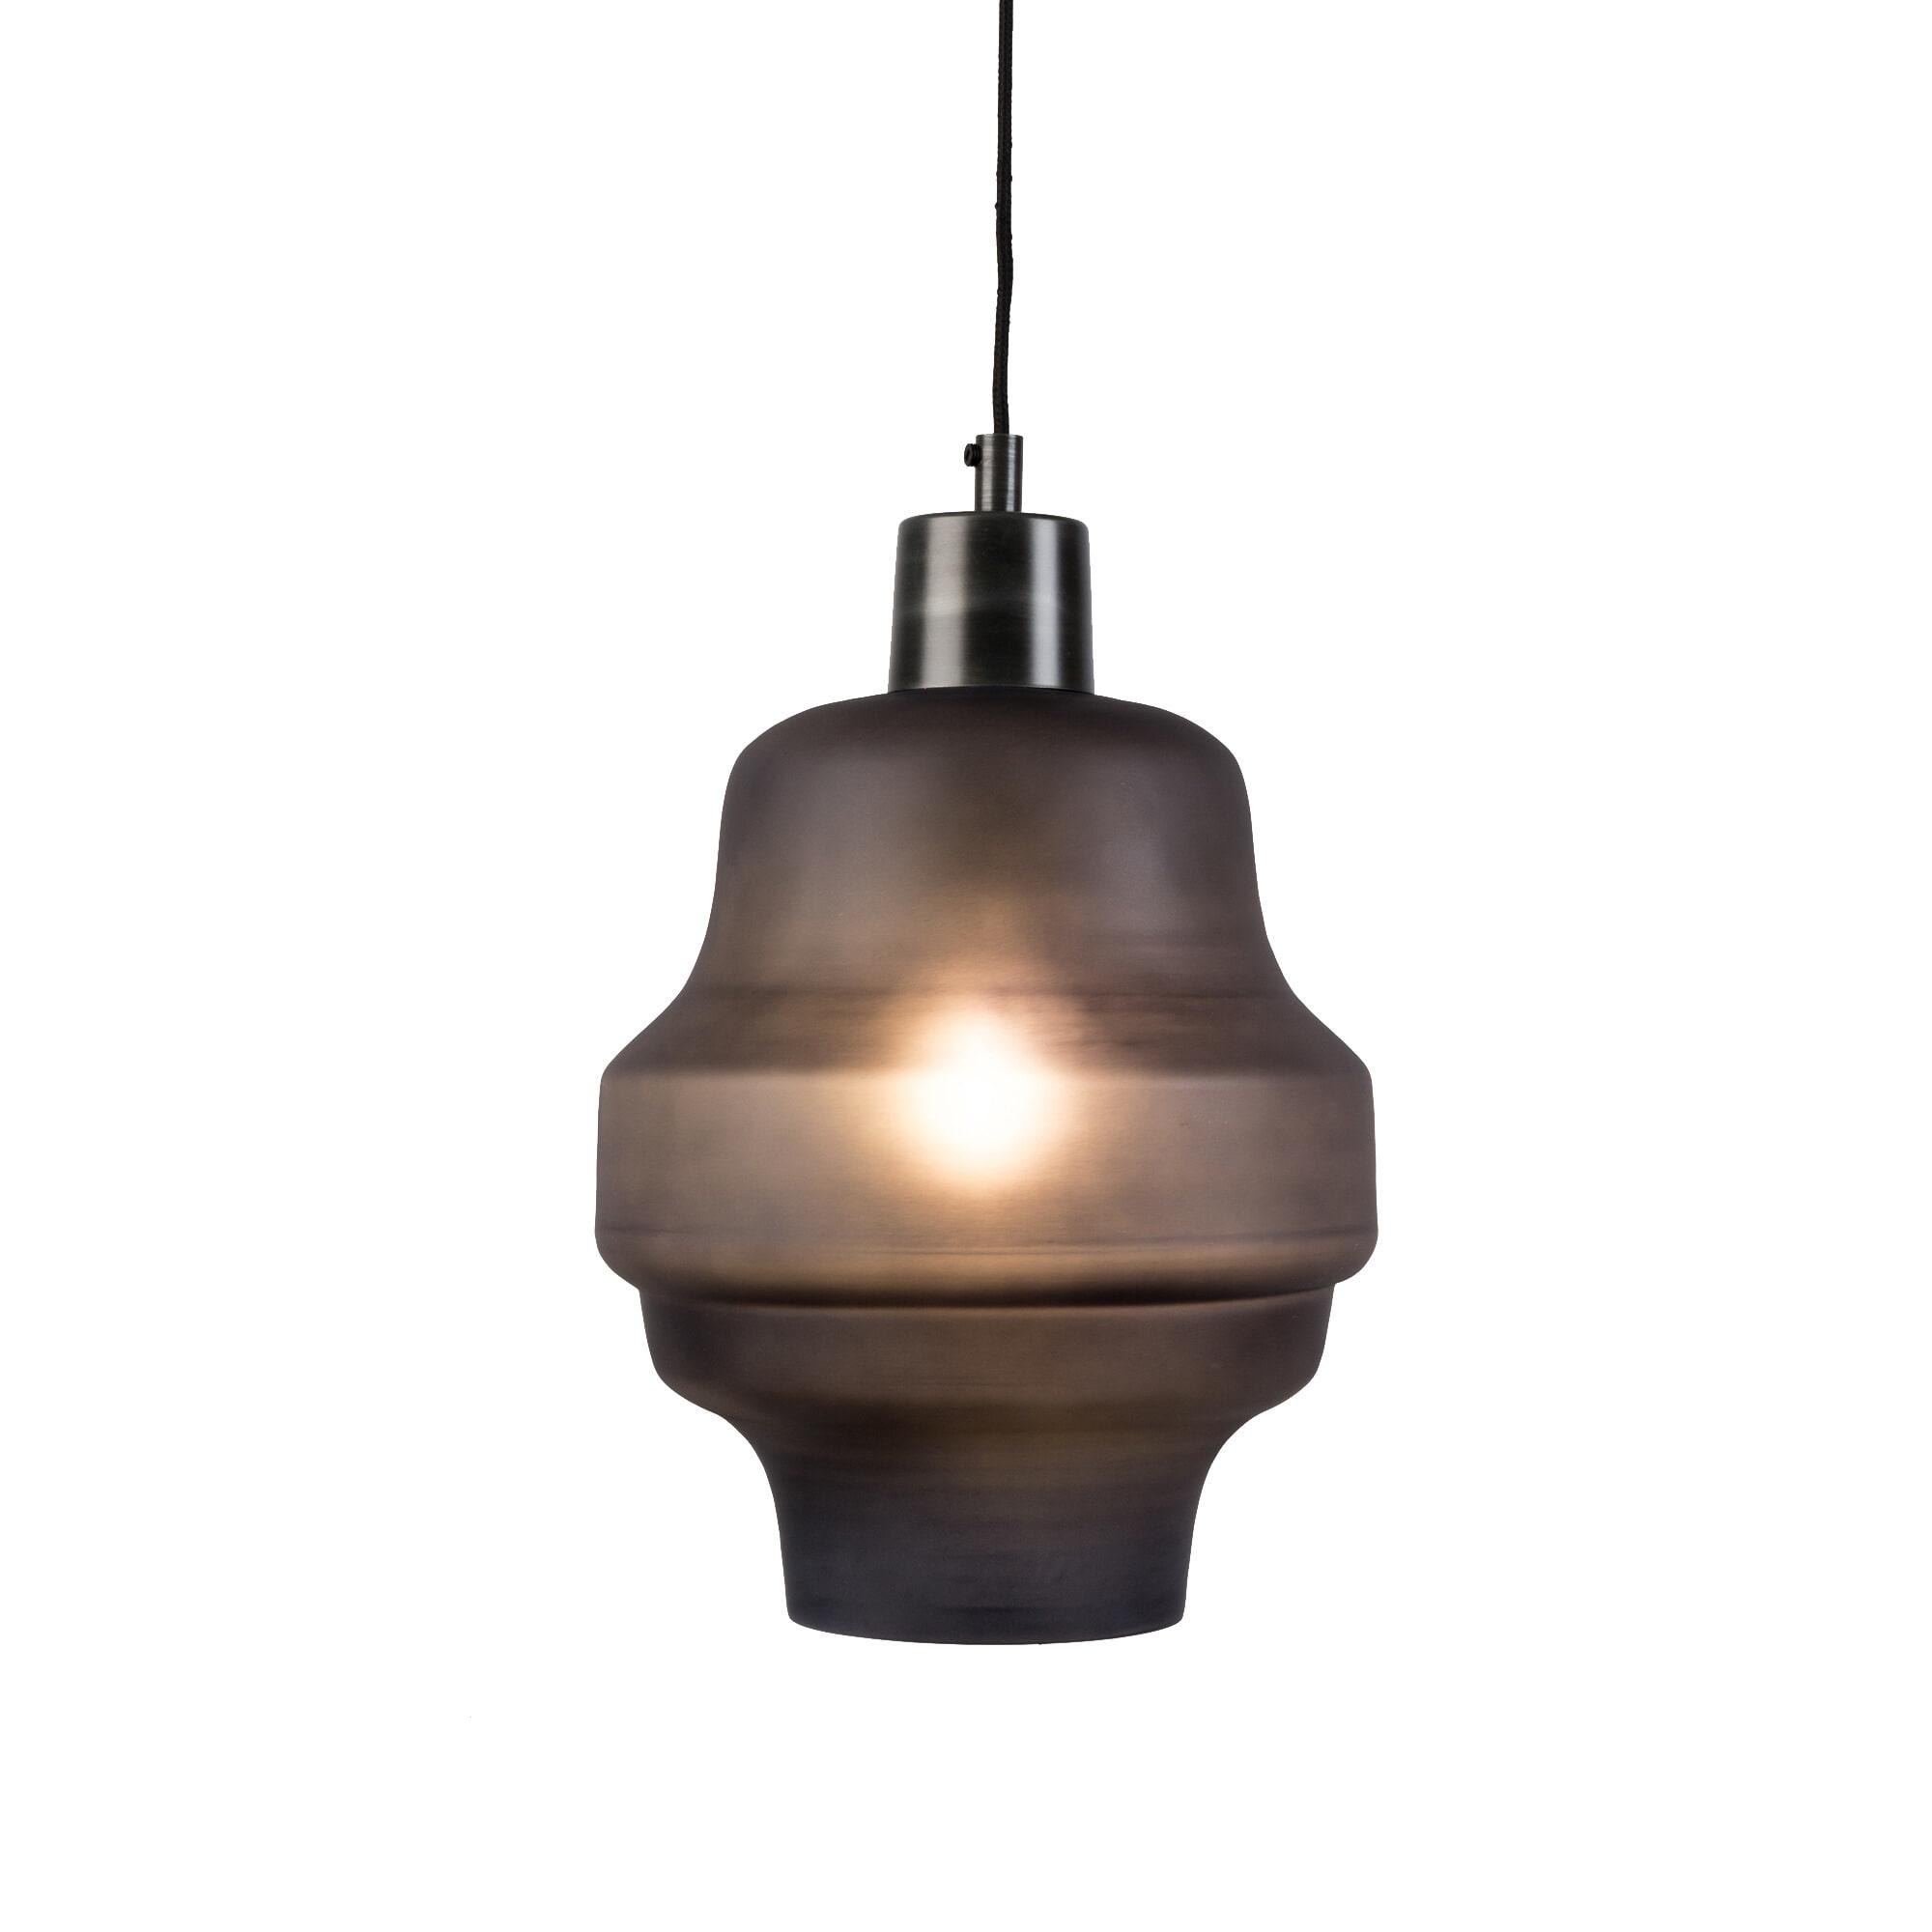 Hanglamp 'Dovydas' 26cm, kleur Antraciet